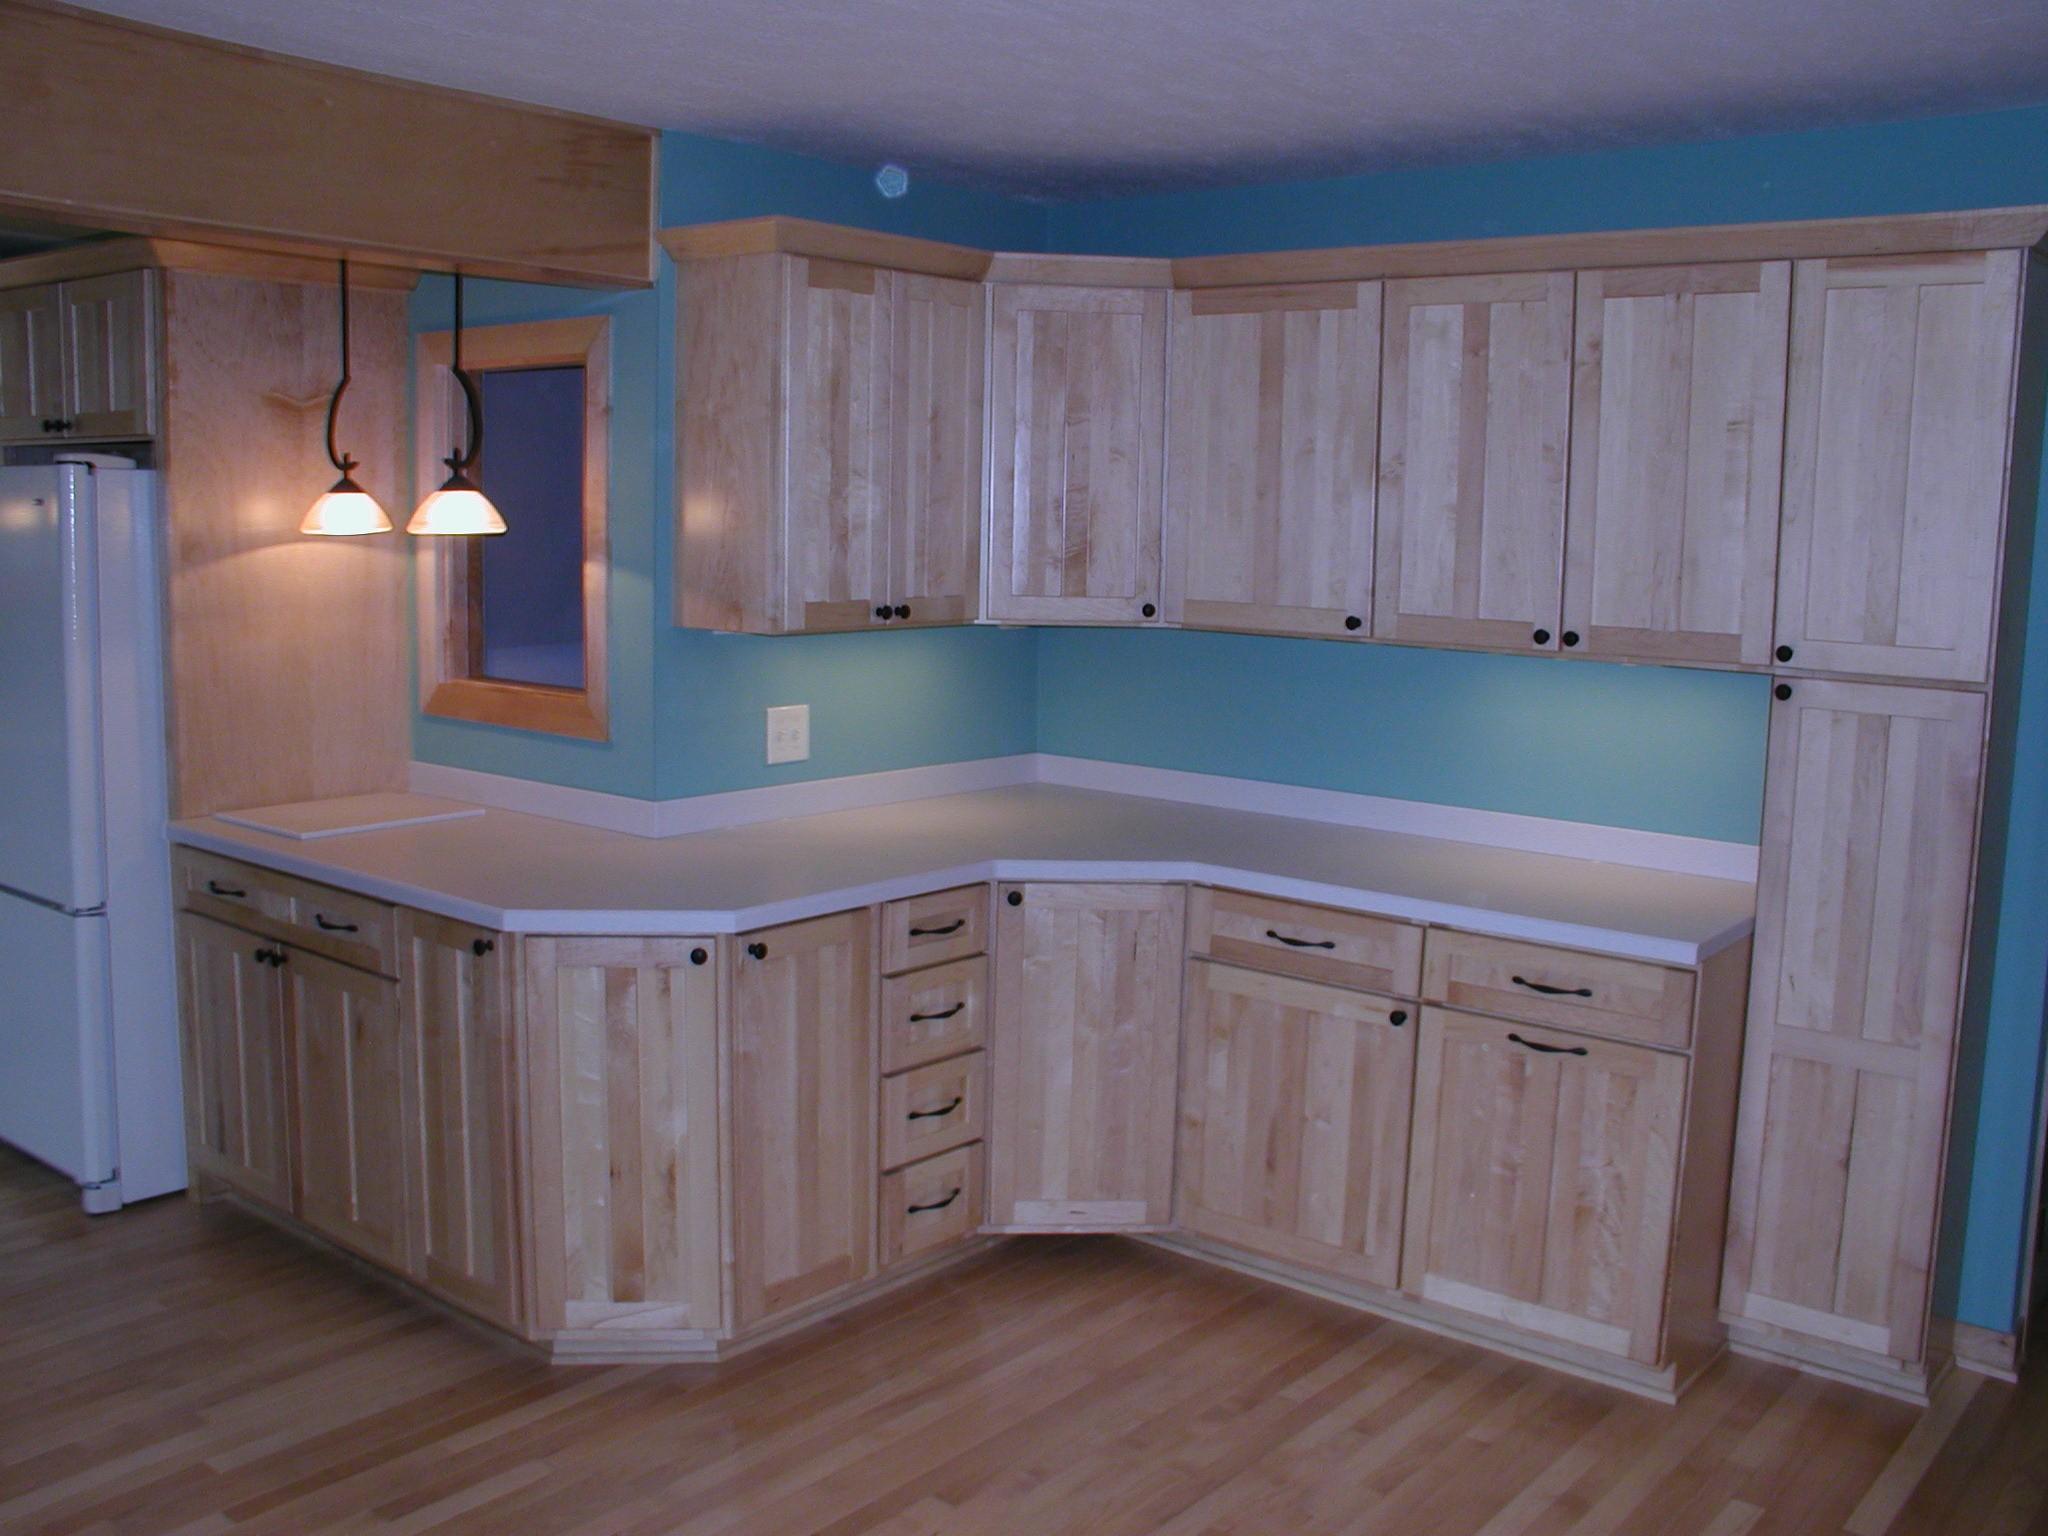 Epic-Building-Company-Worthington-Ohio-Kitchen-Remodel2